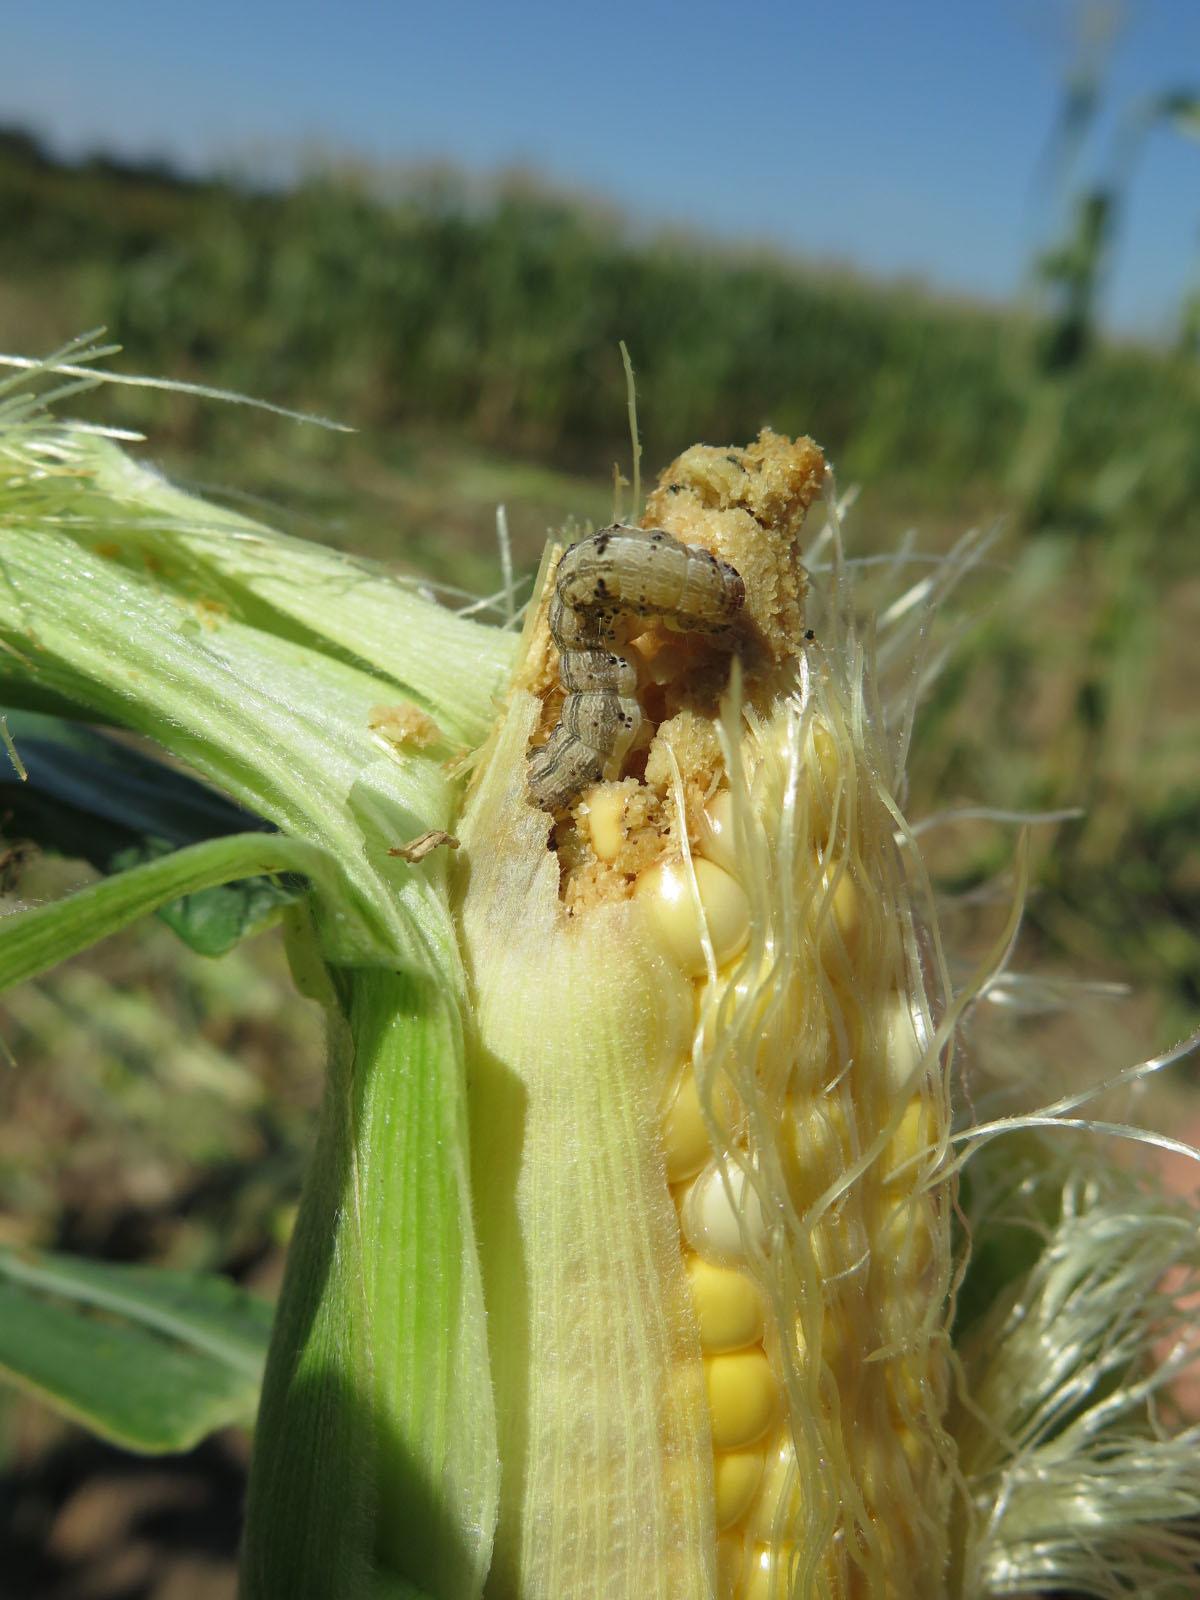 Corn Earworms | Purdue University Vegetable Crops Hotline